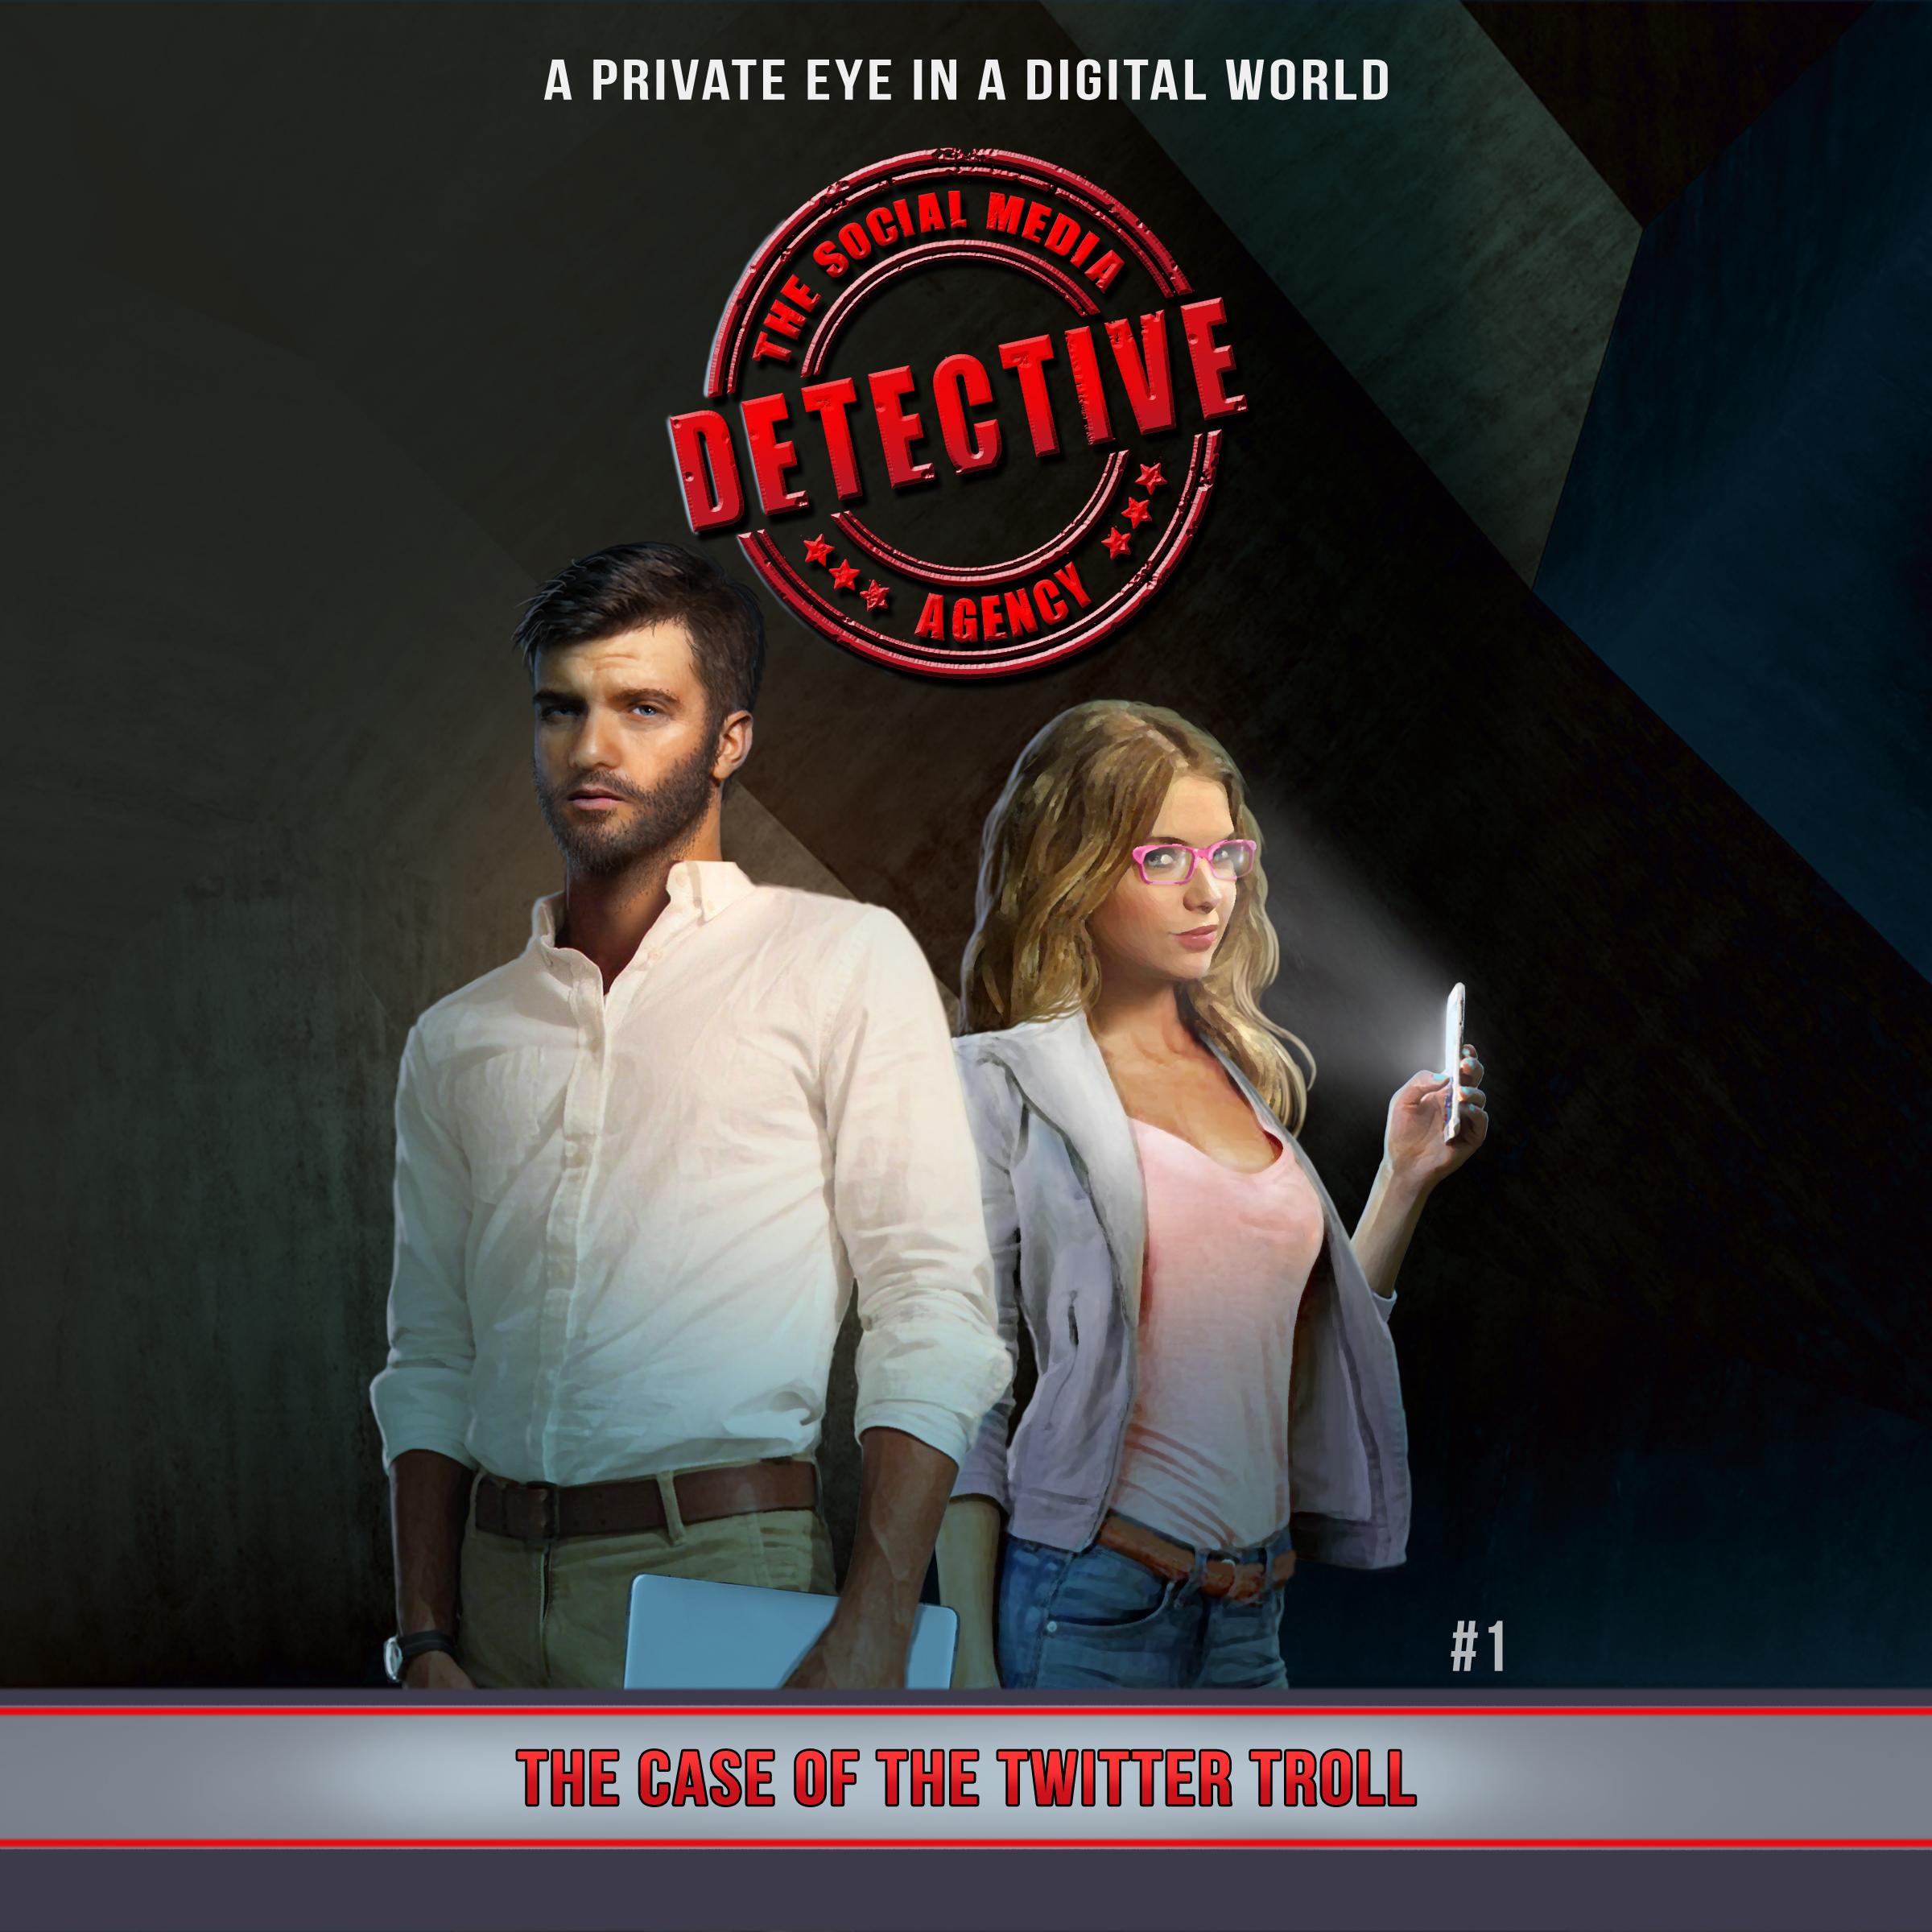 The Social Media Detective Agency